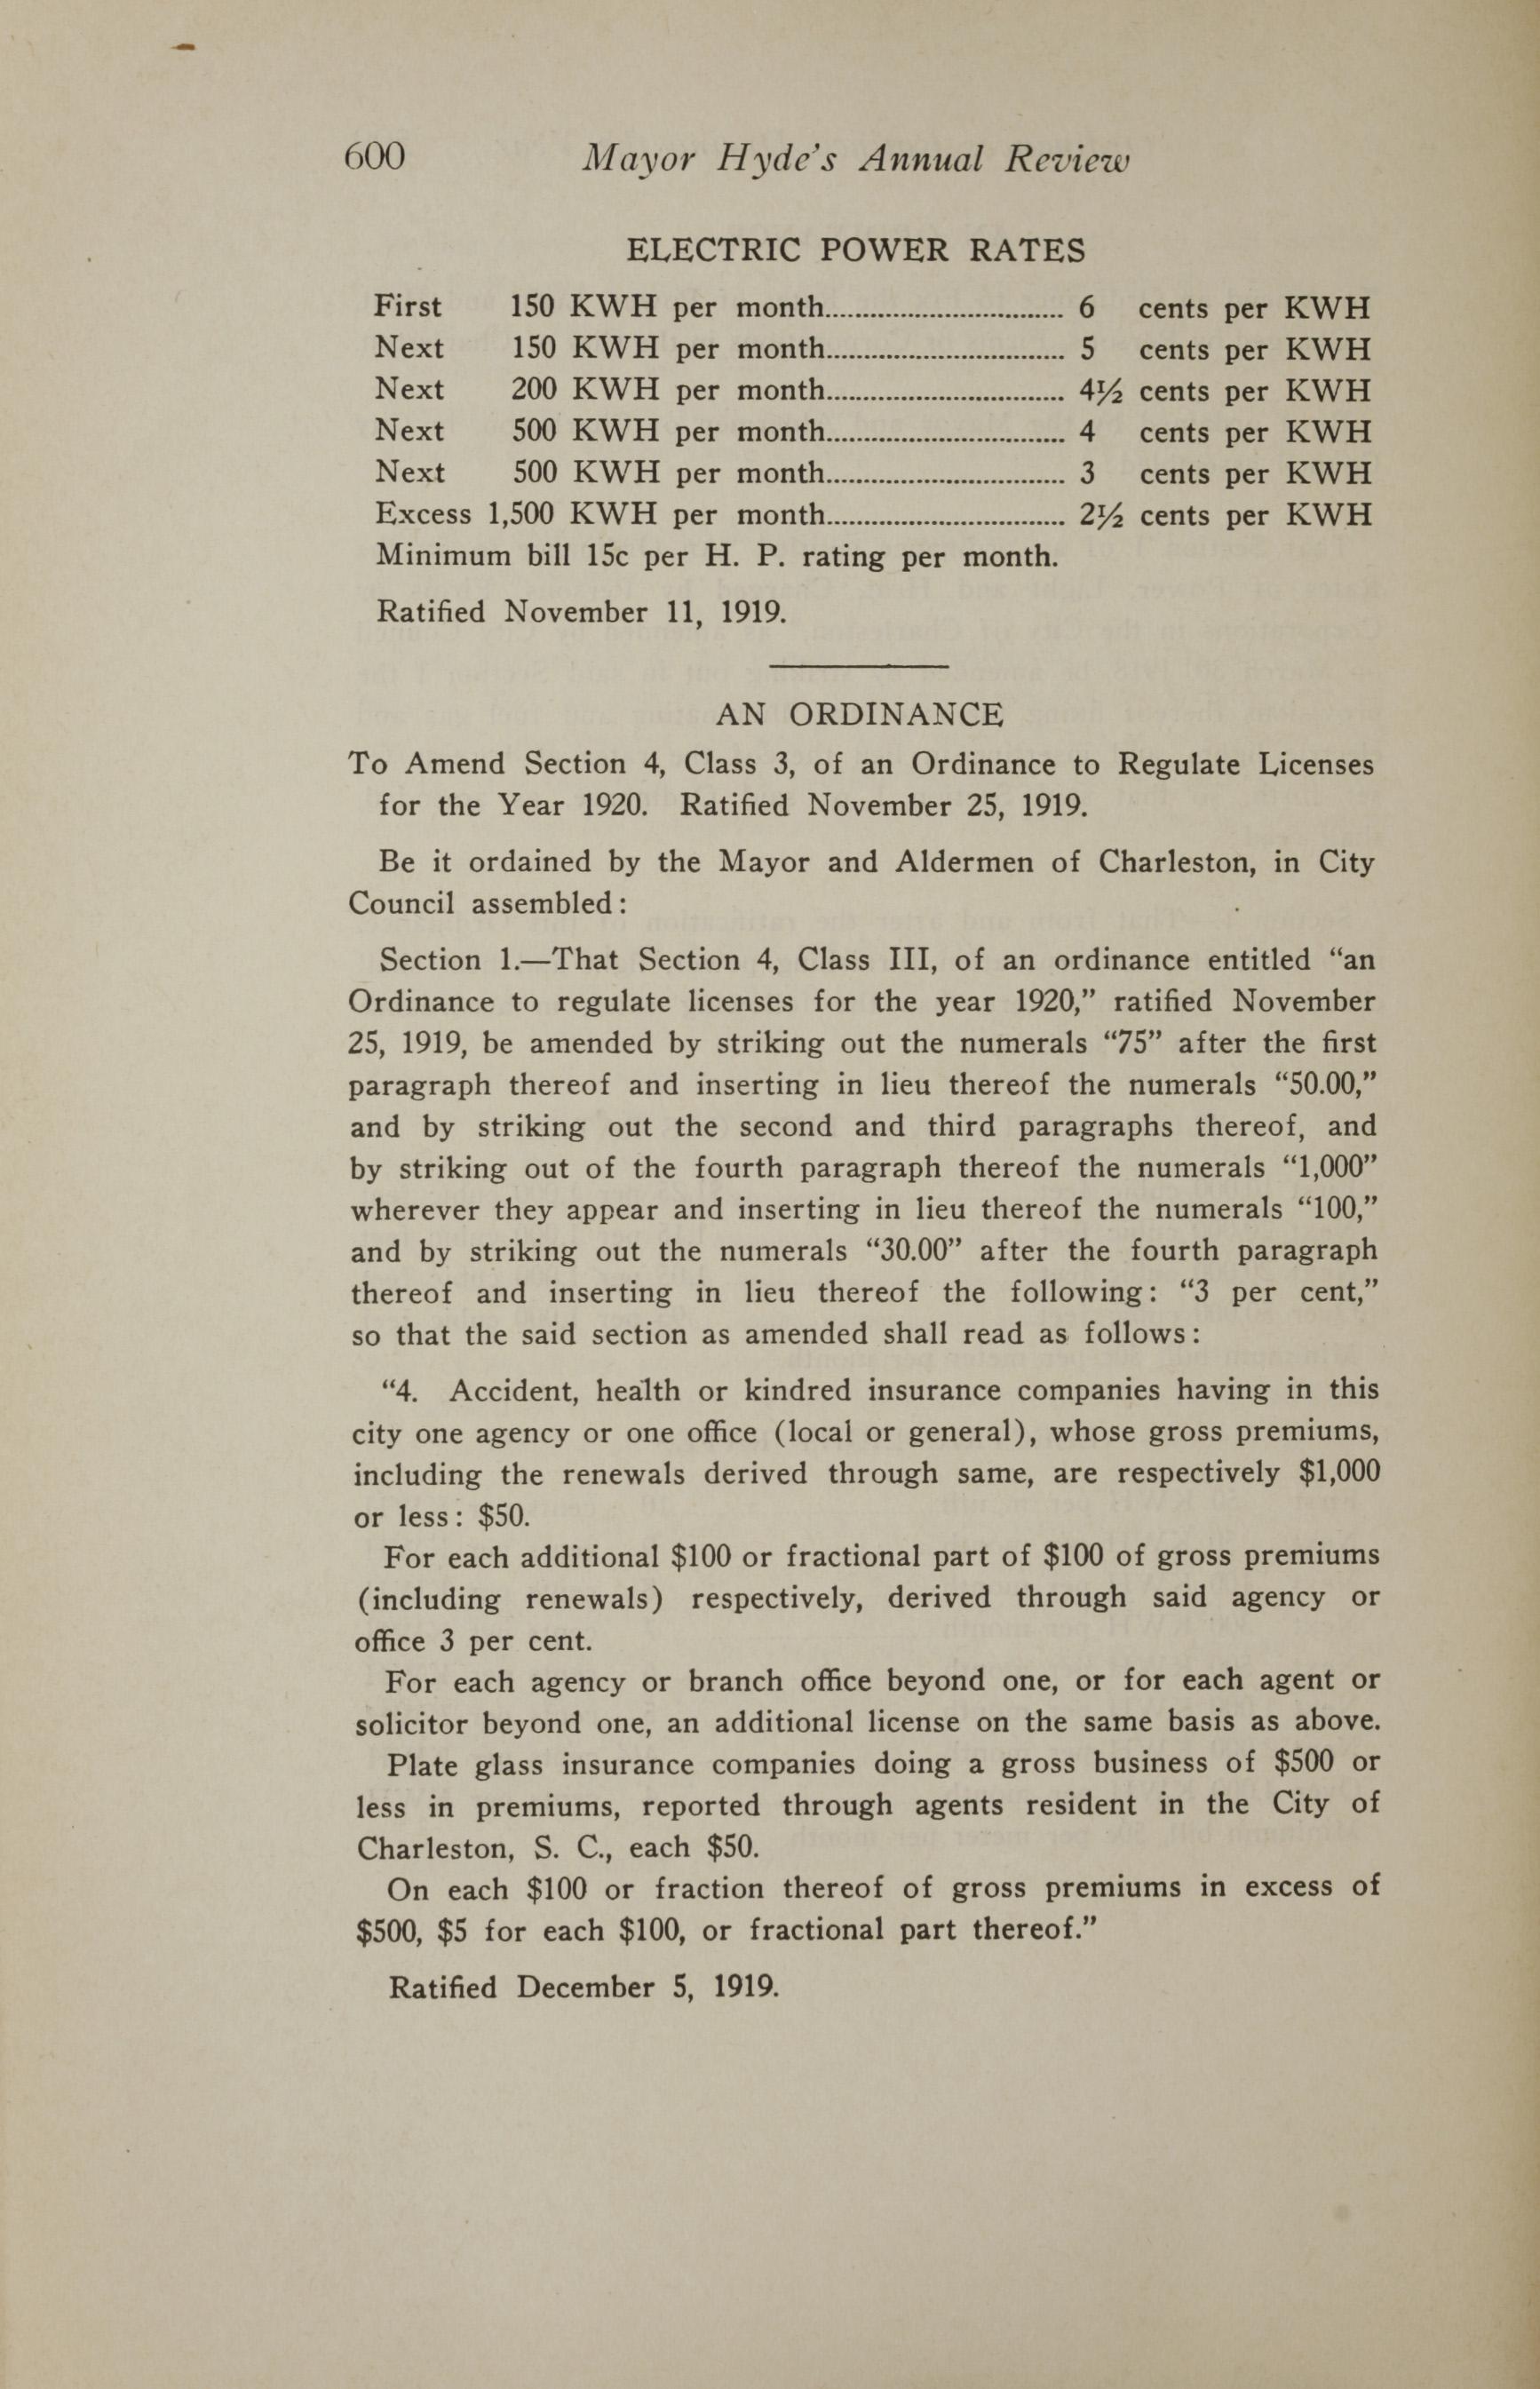 Charleston Yearbook, 1919, page 600